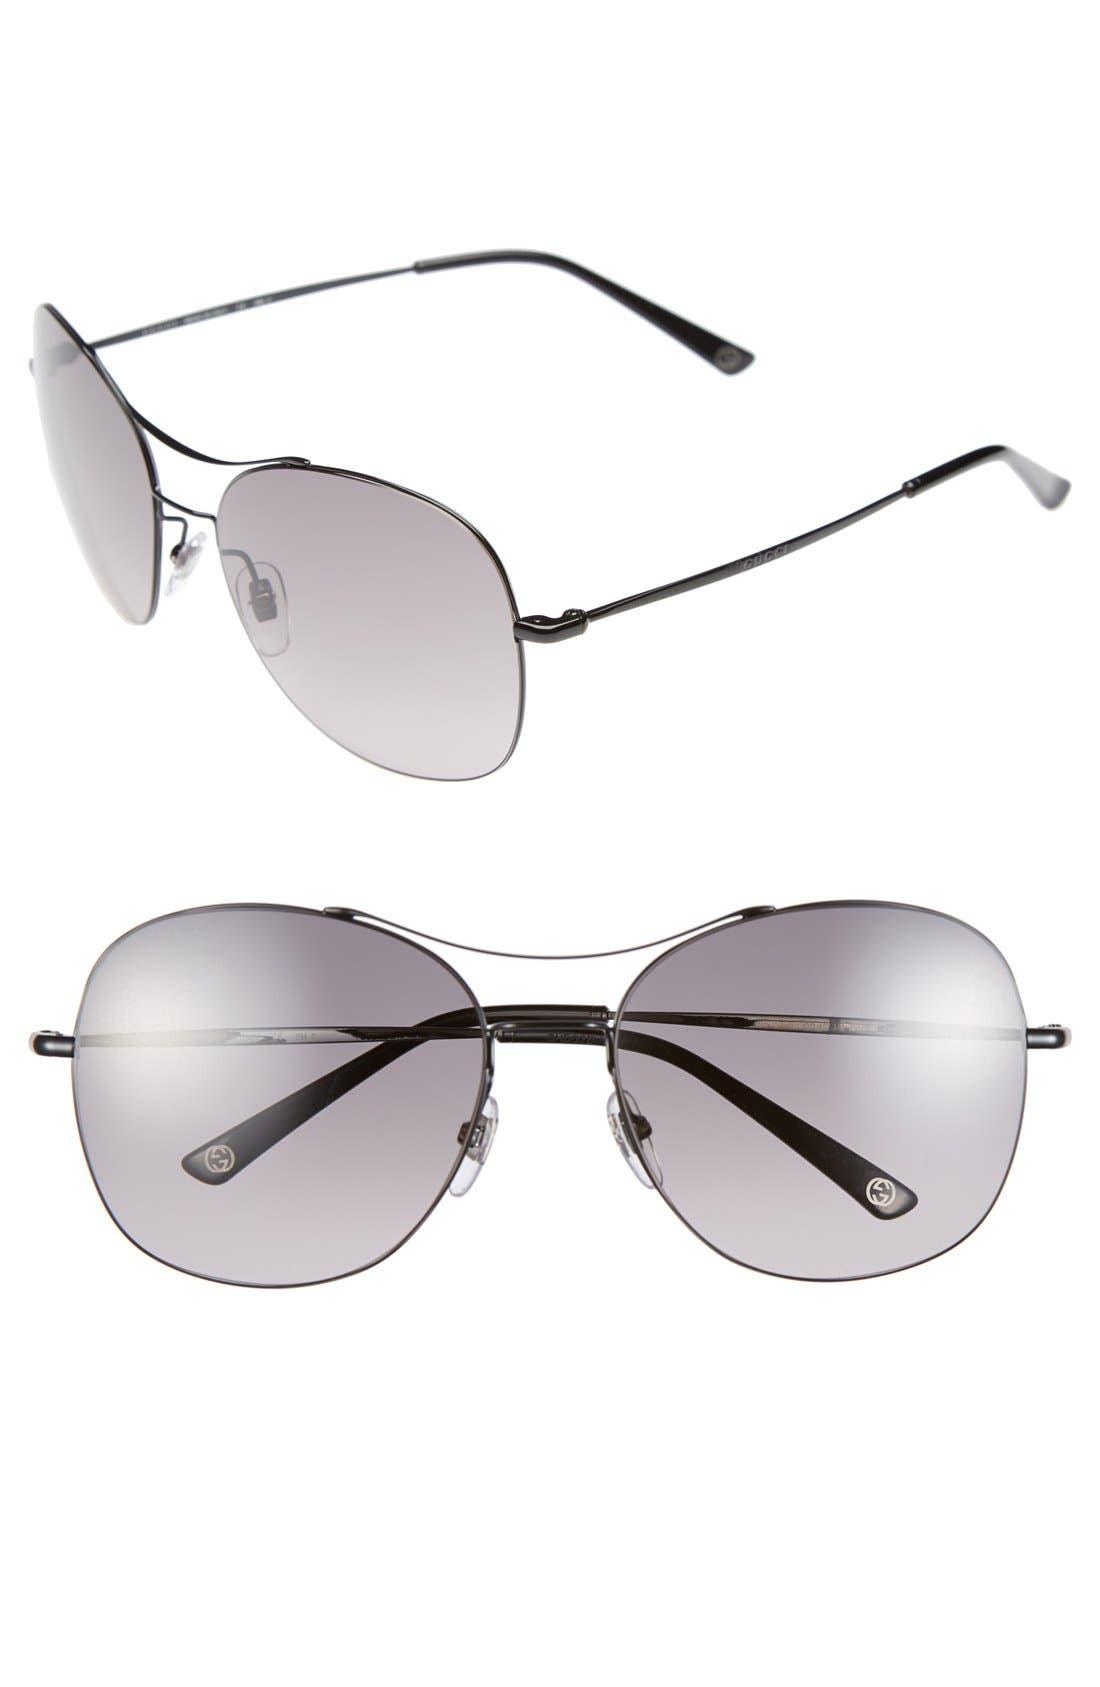 Main Image - Gucci 58mm Navigator Stainless Steel Sunglasses